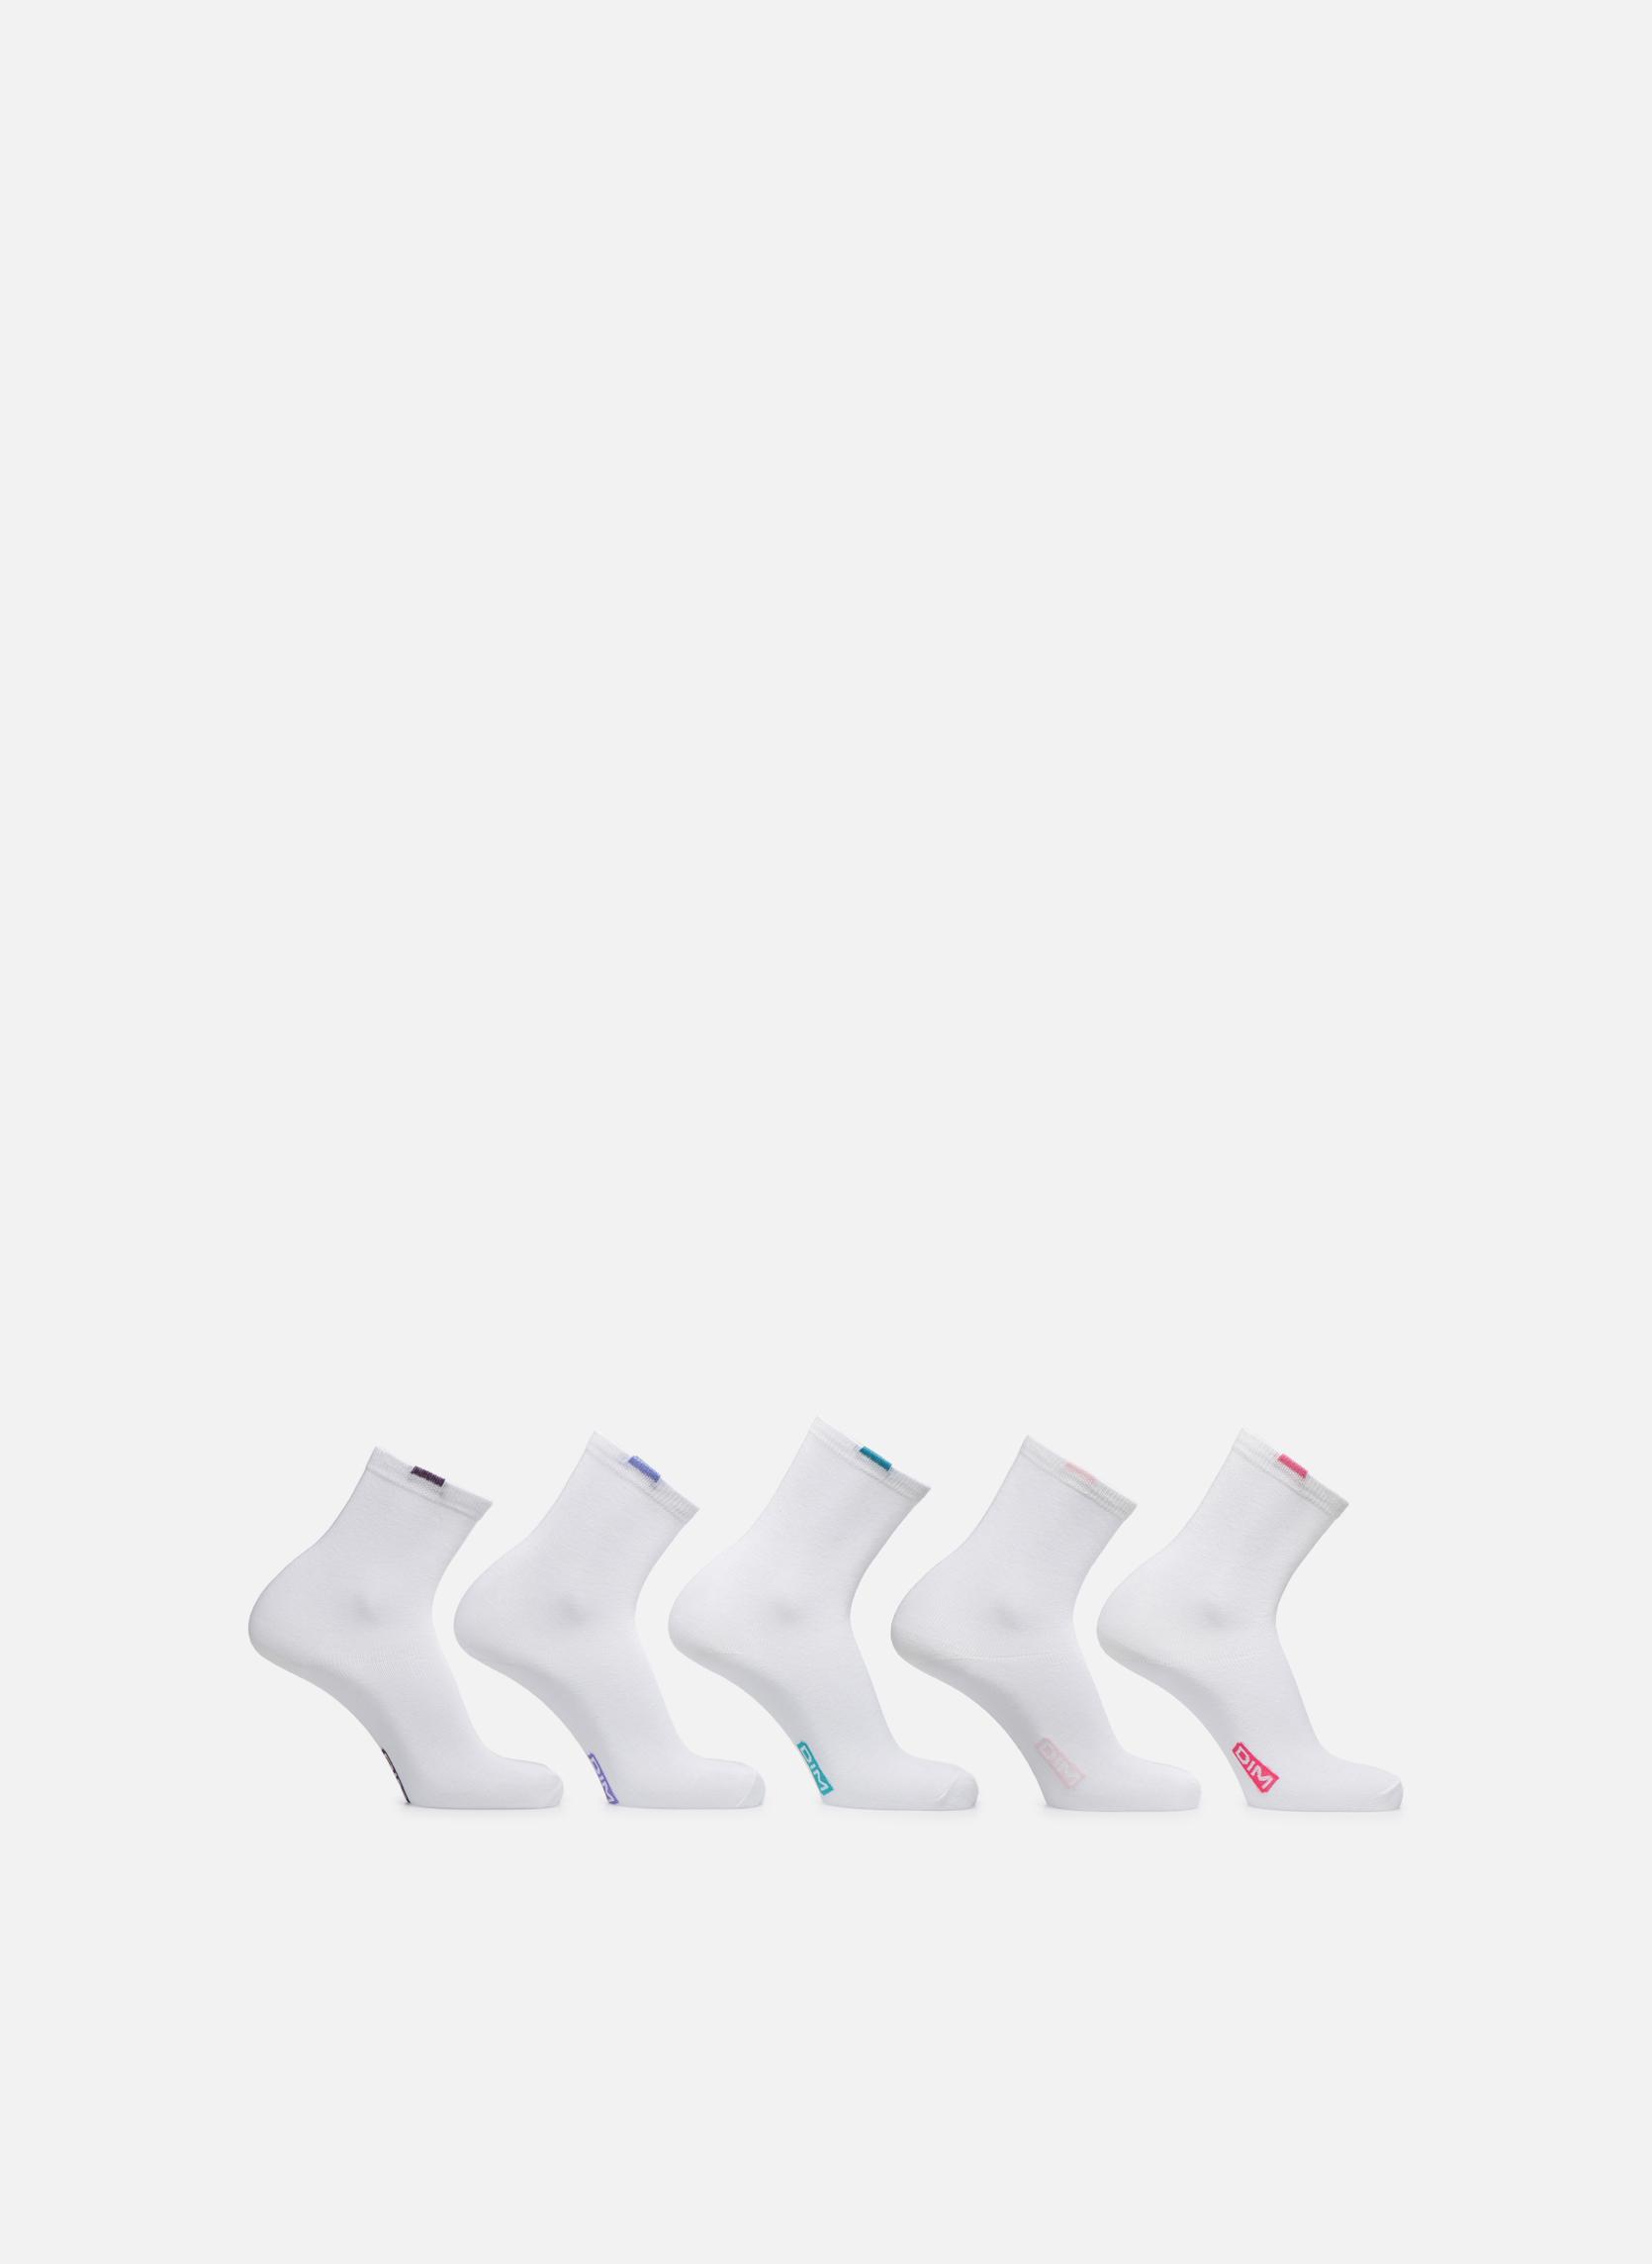 Socken & Strumpfhosen Accessoires Chaussettes EcoDimW Pack de 5